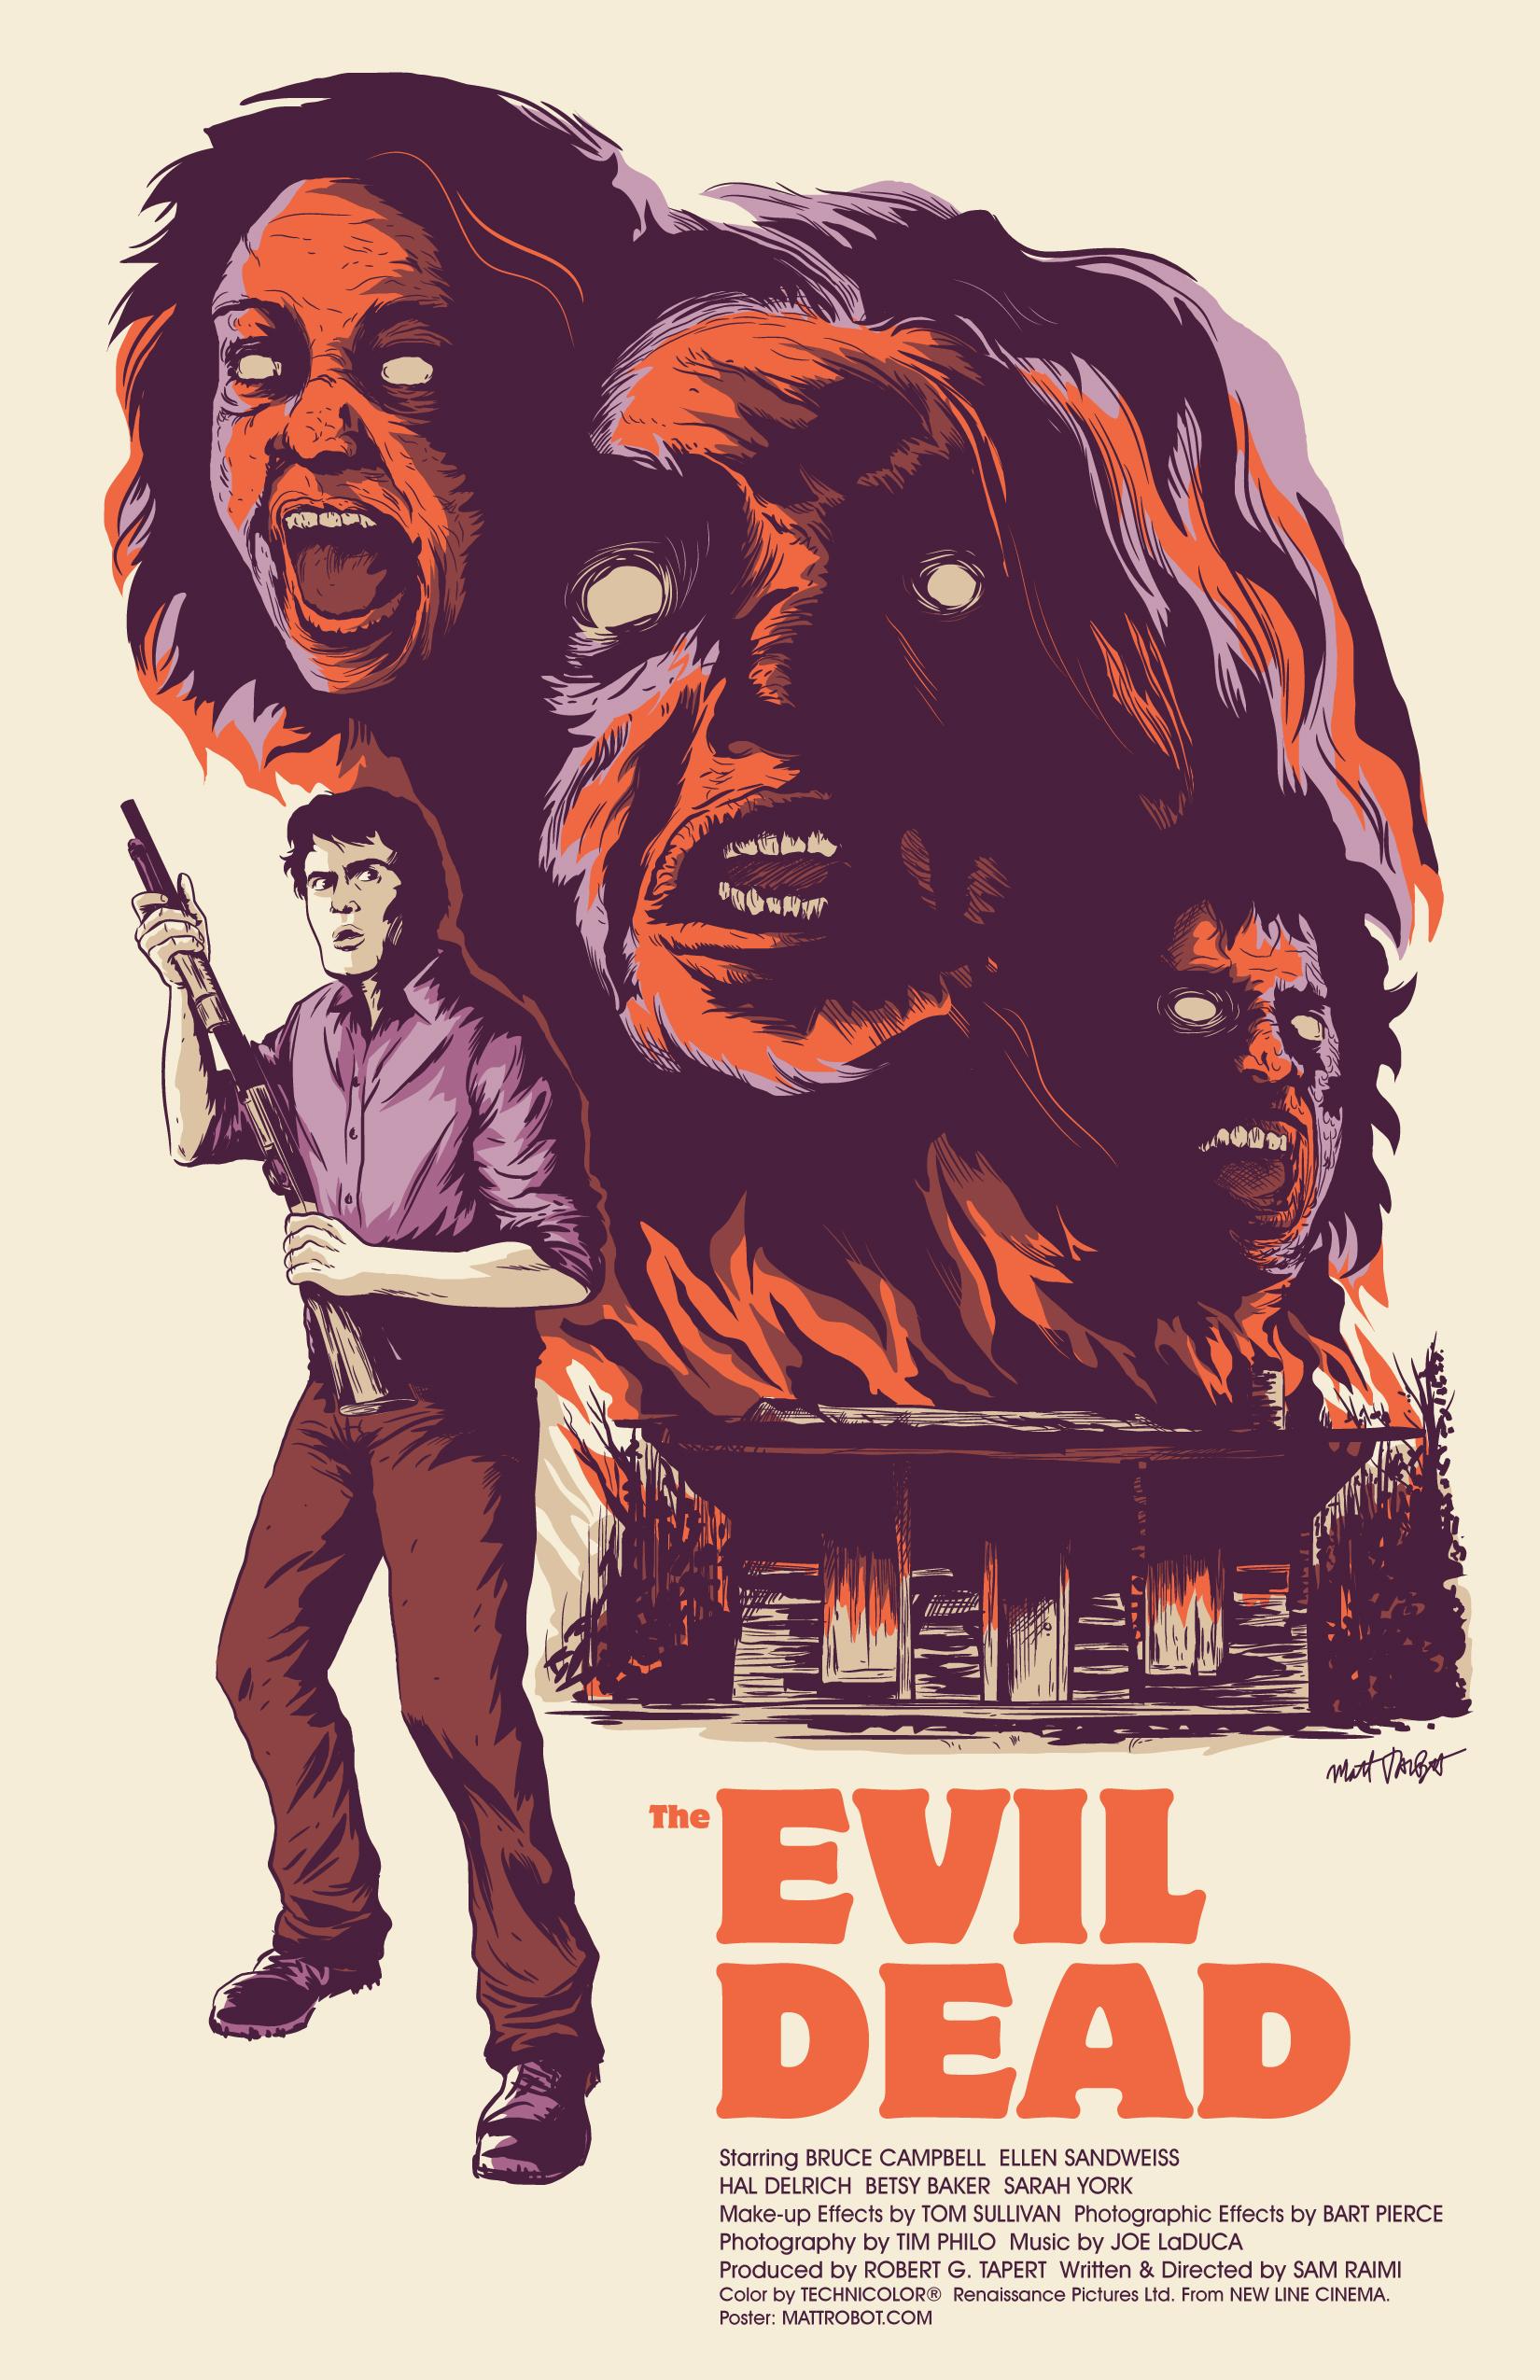 The Evil Dead Poster by Matt Talbot